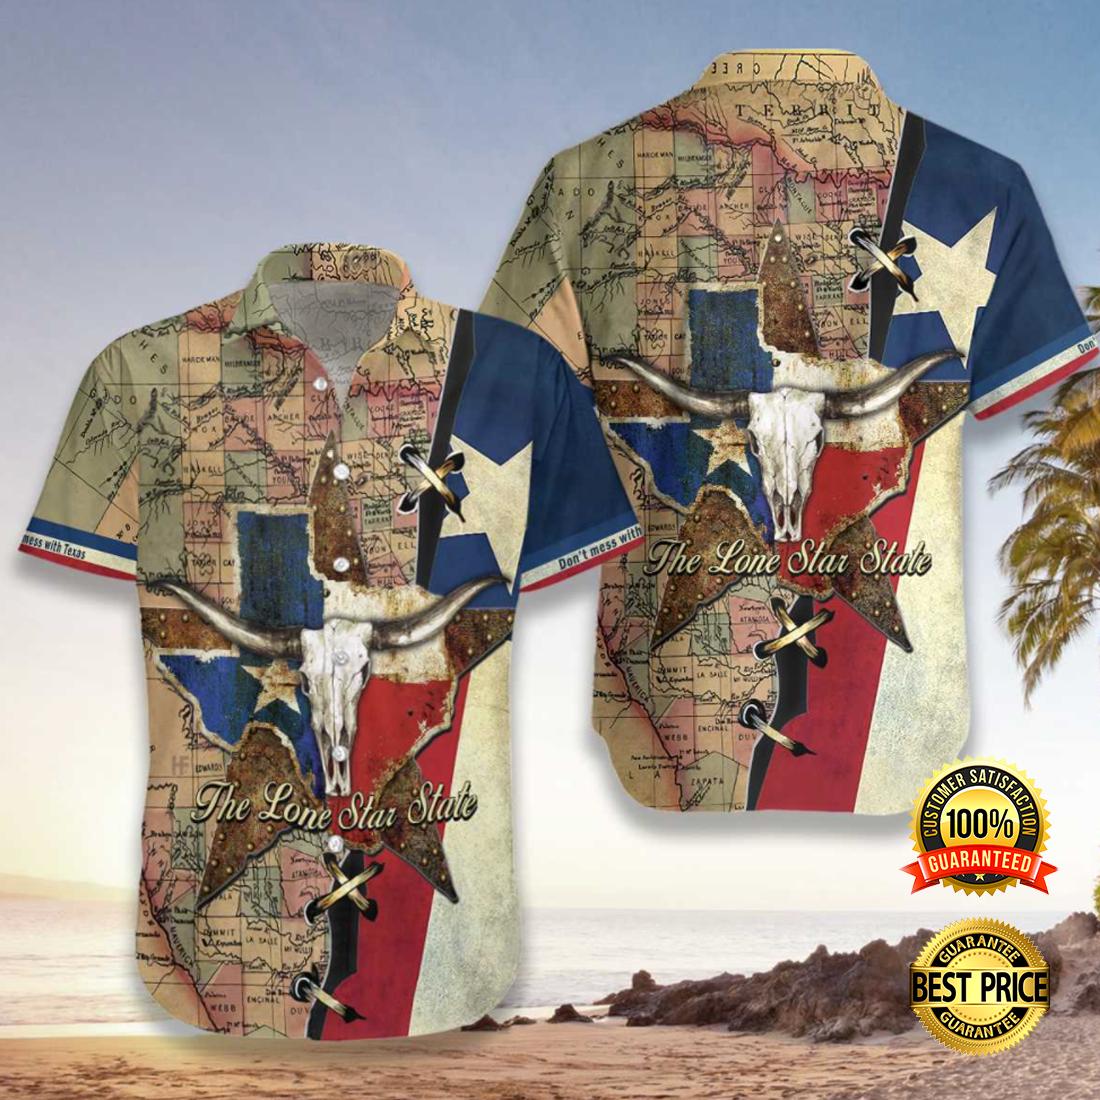 Texas the lone star state hawaiian shirt 5